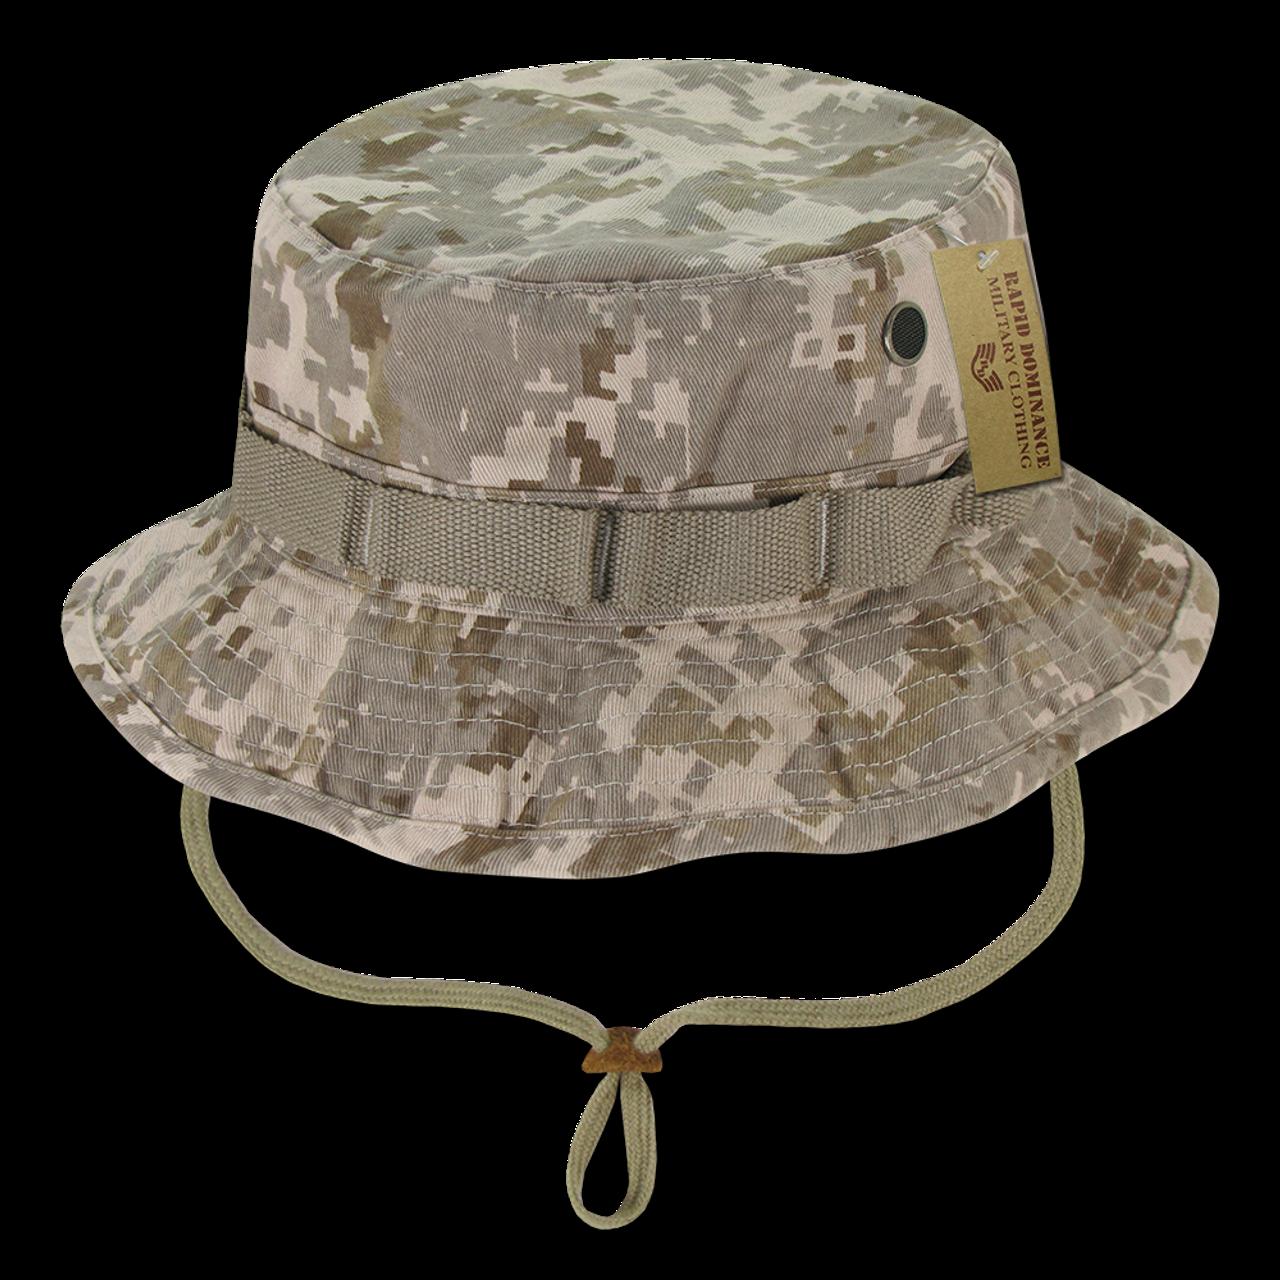 Rapid Dominance R70 Jungle Boonie Hats - Desert Digital Camouflage 3a7af2541bf